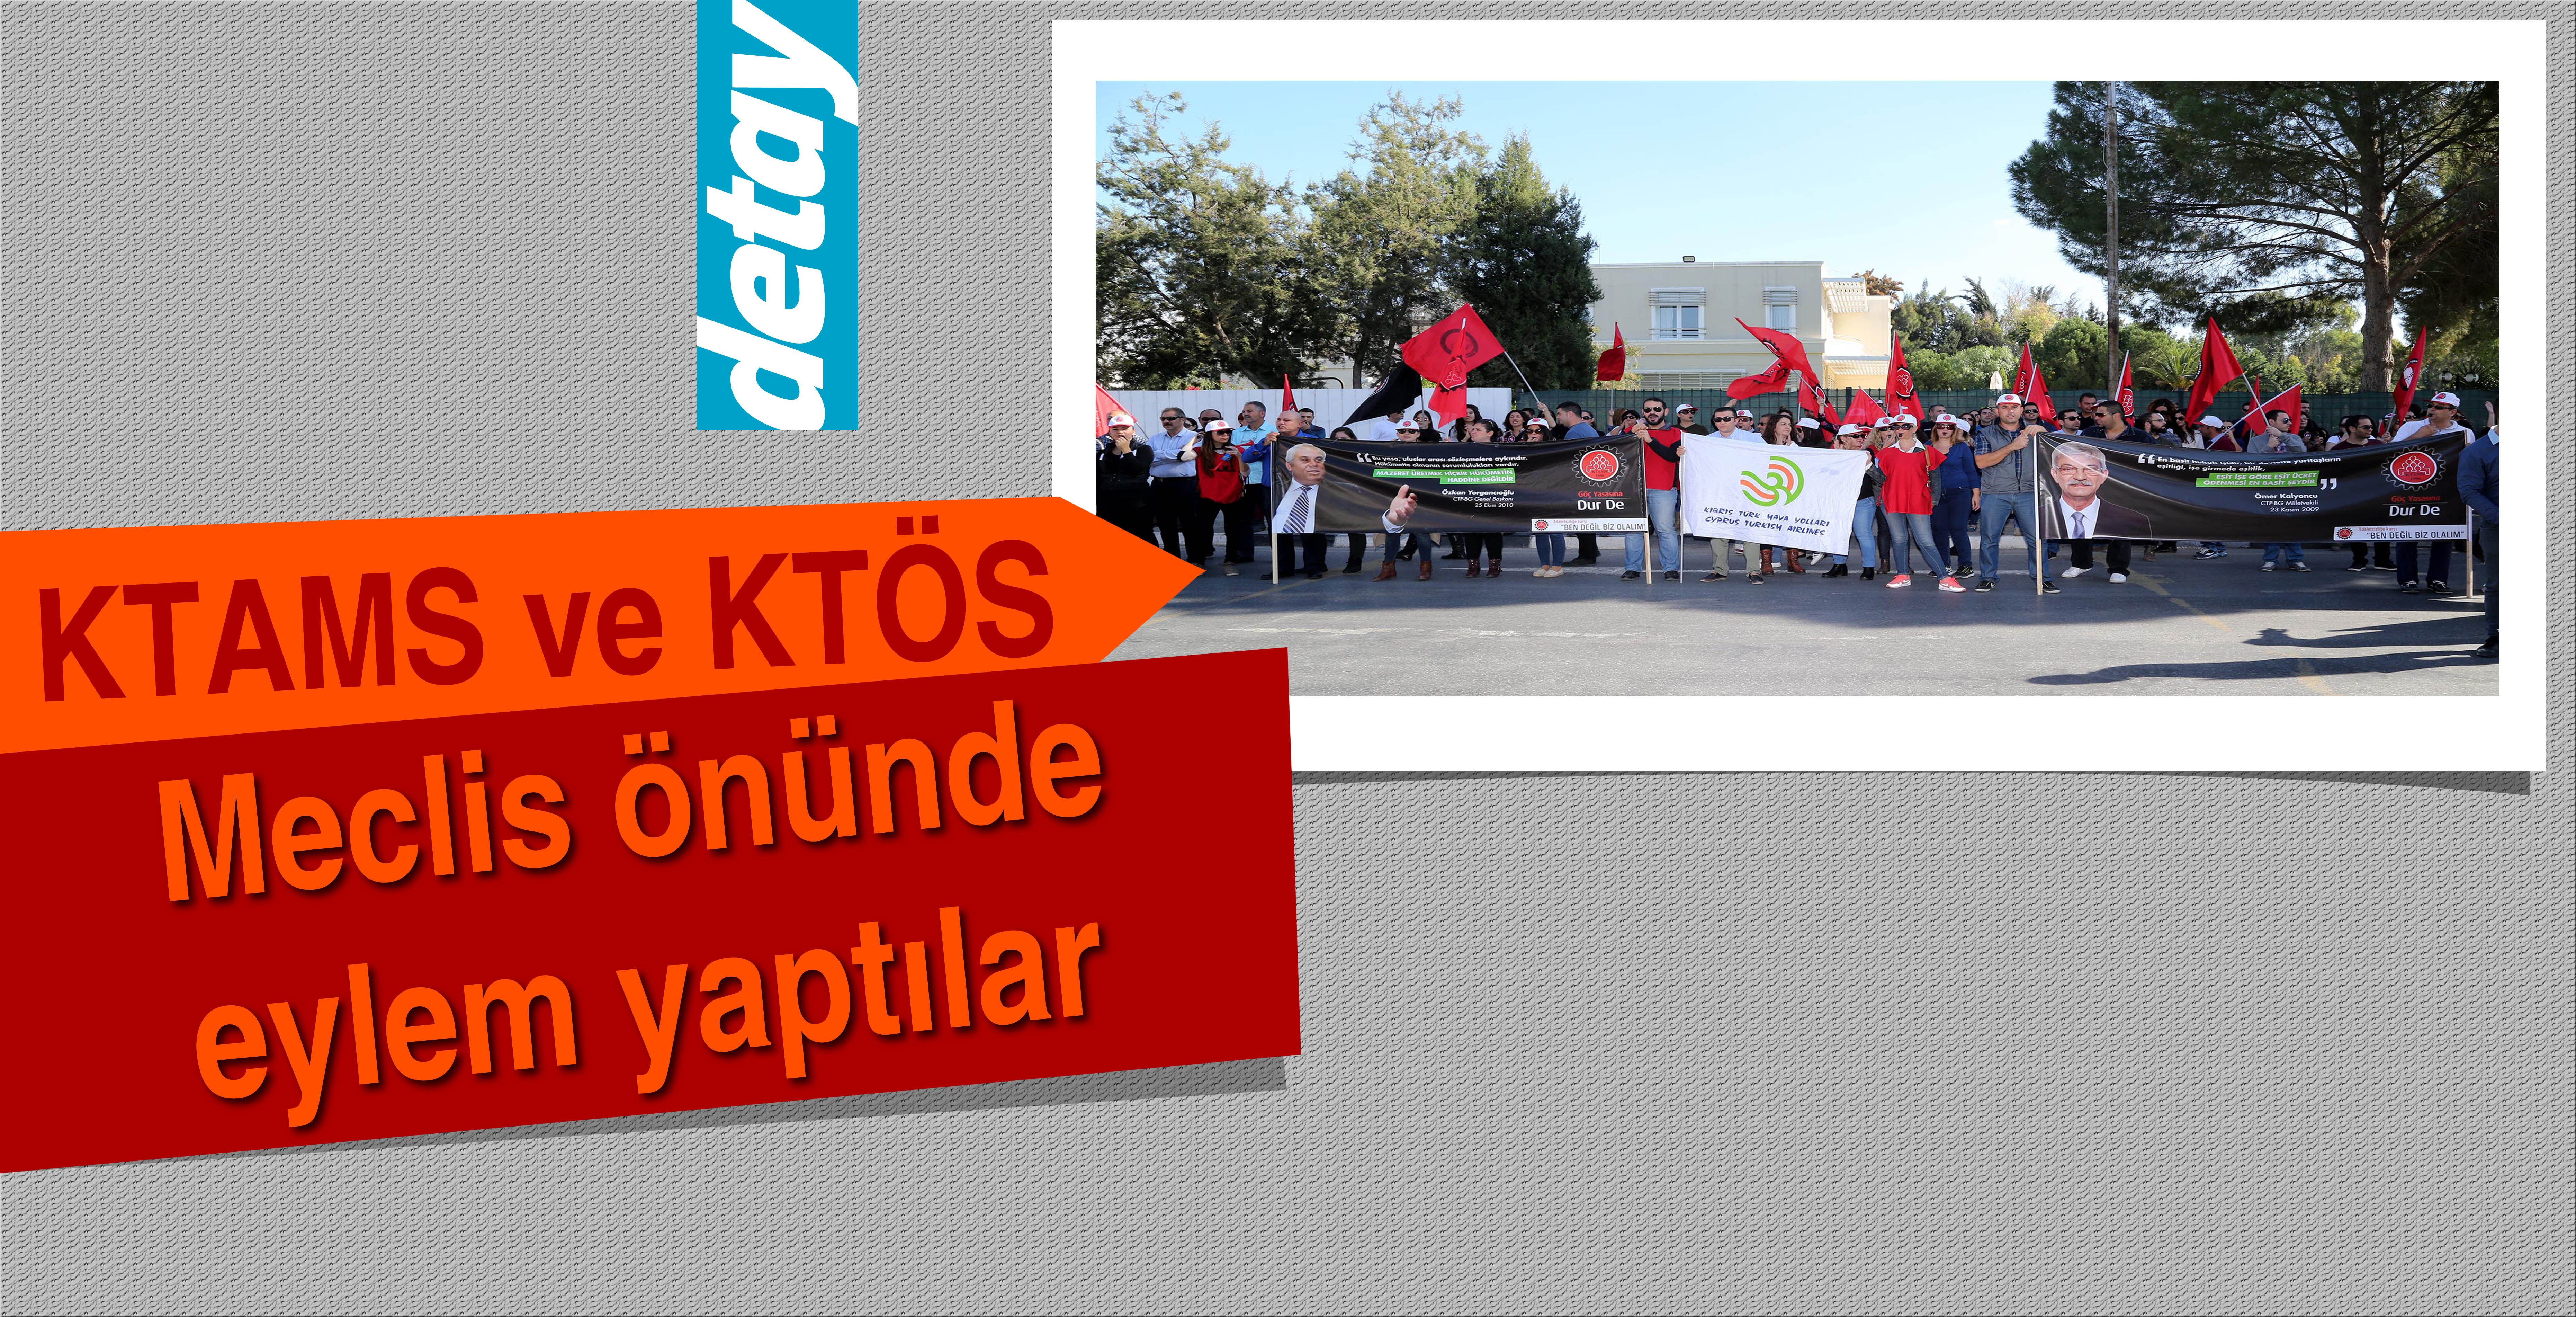 KTAMS ve KTÖS Meclis önünde eylem yaptı